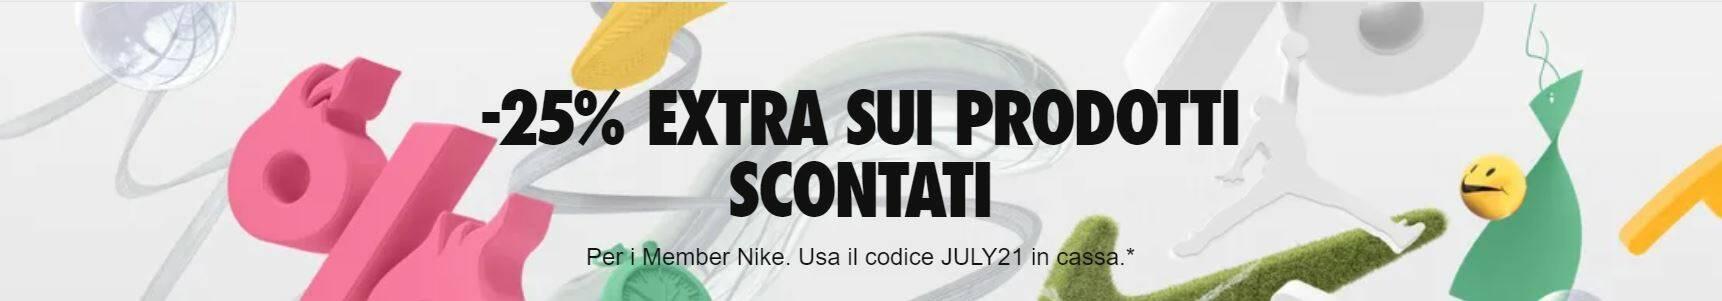 Nike 25% di sconto